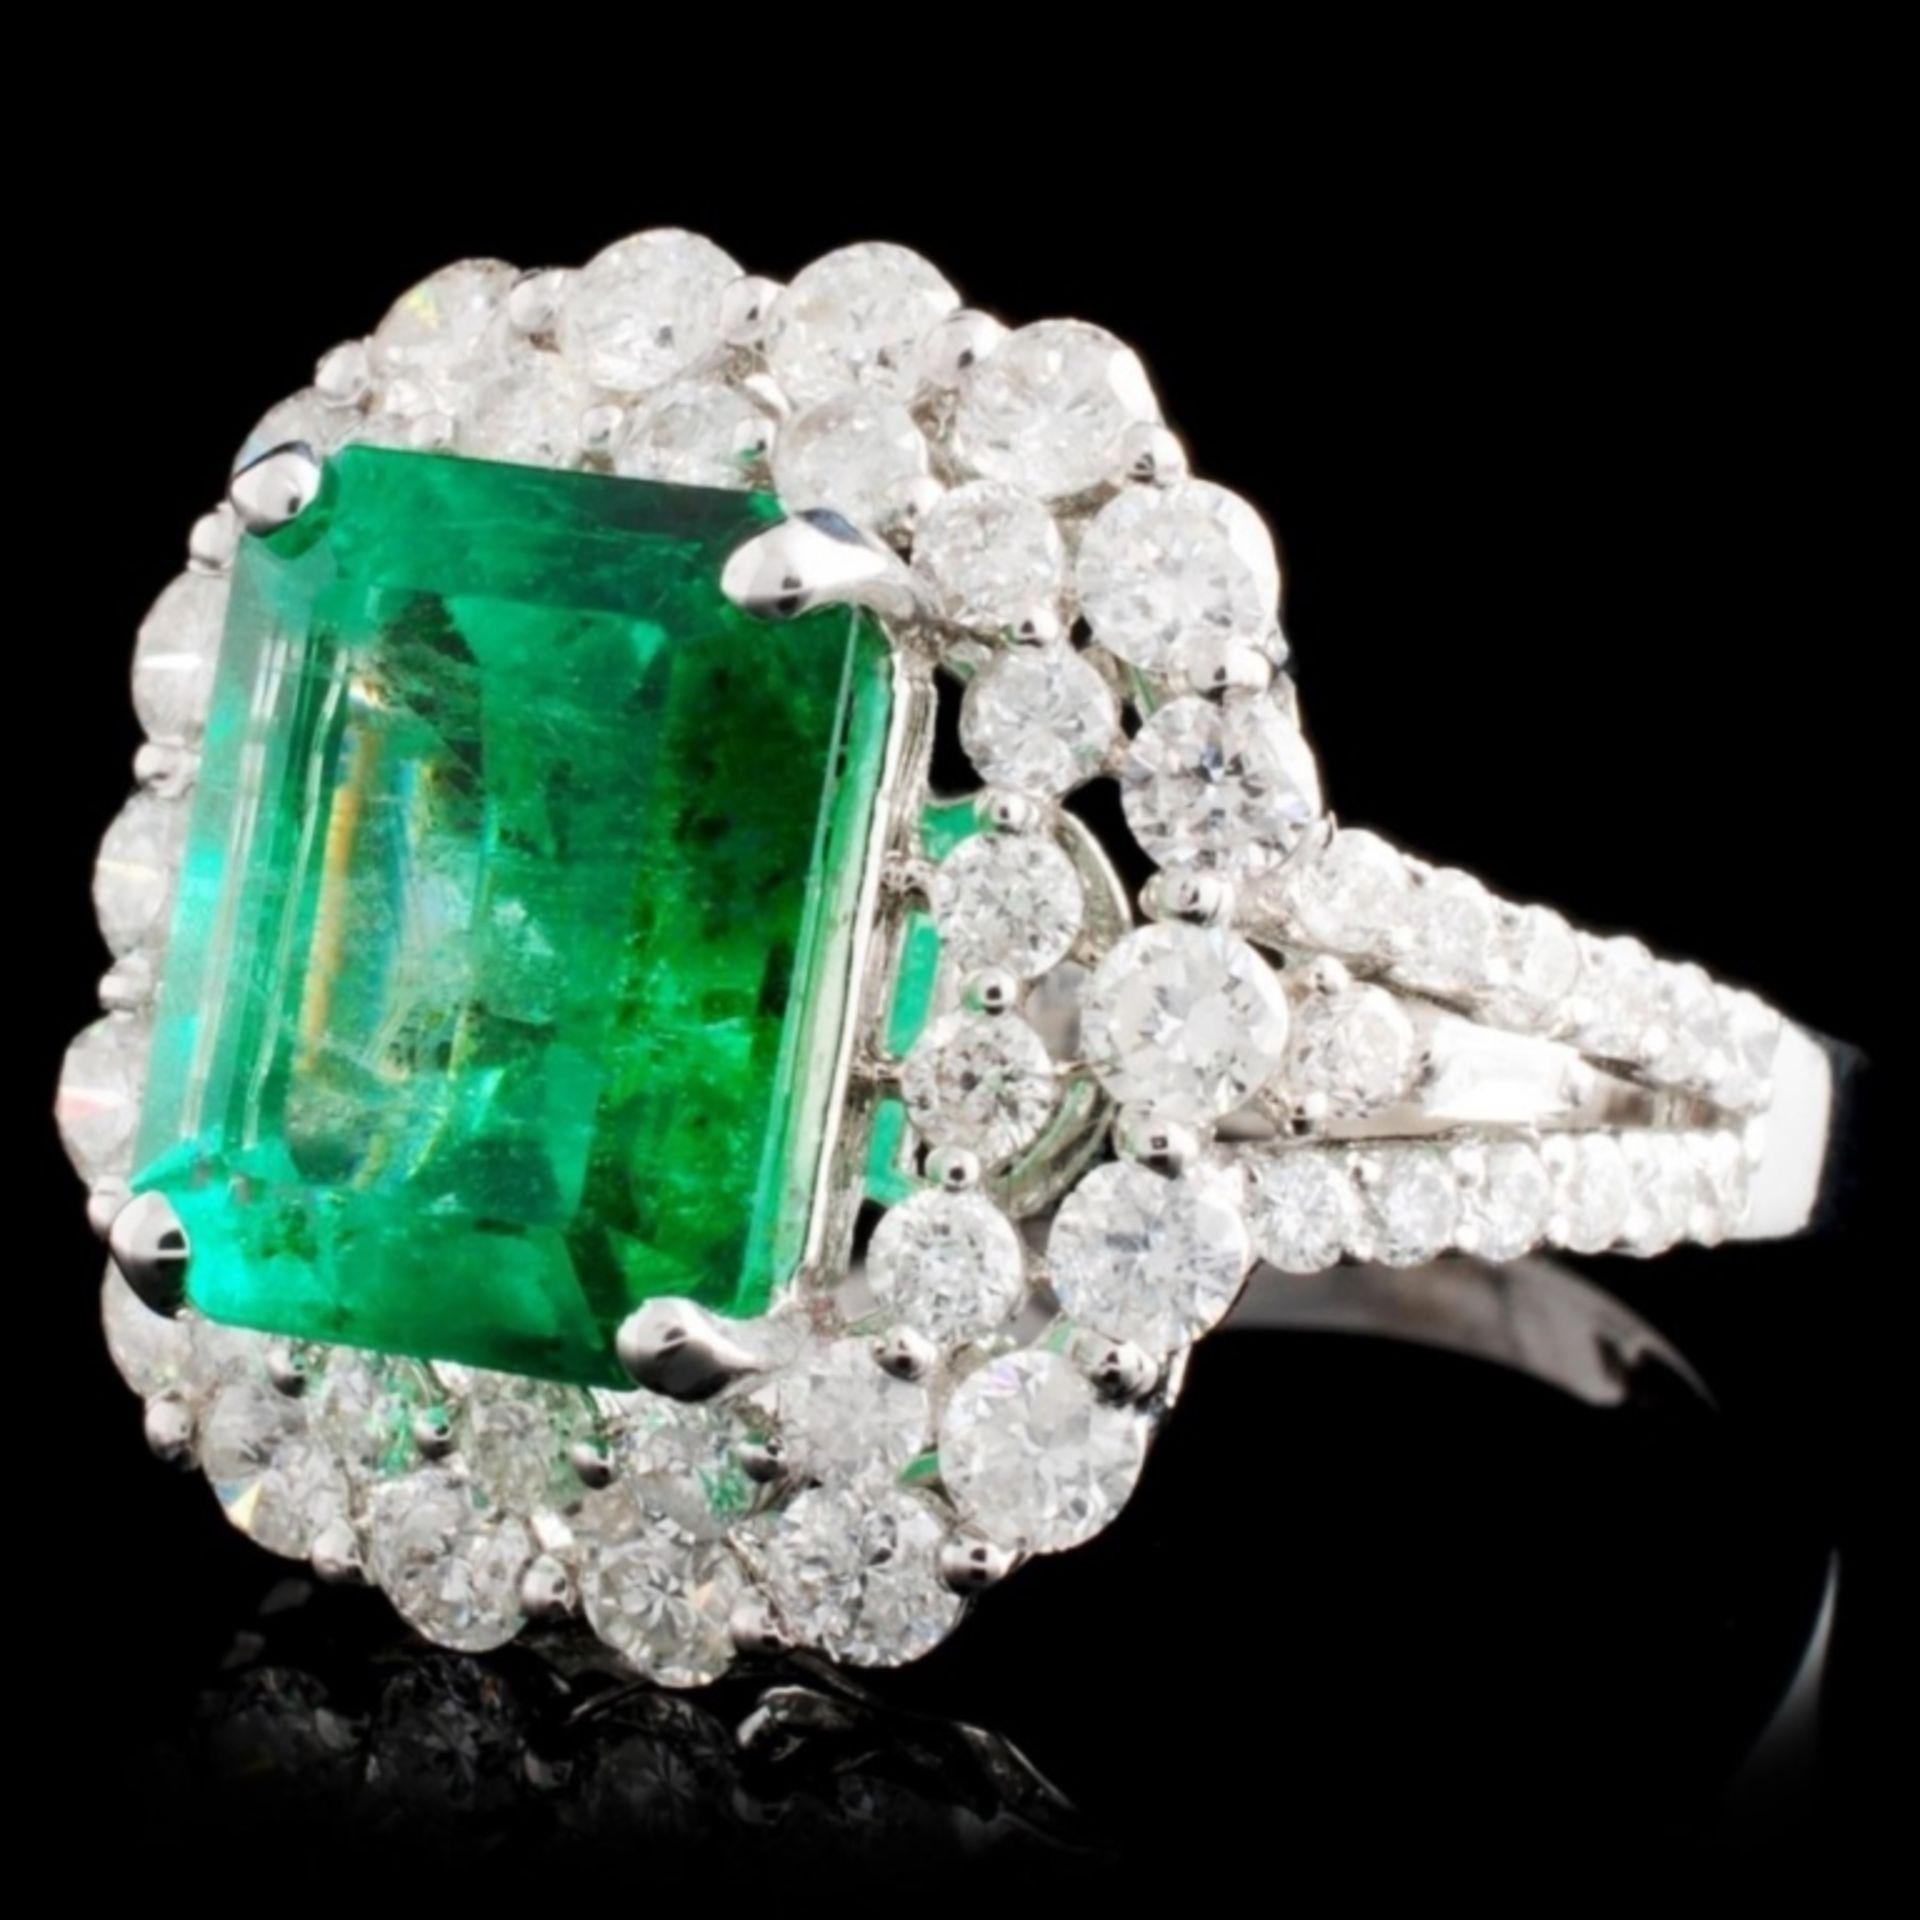 18K W Gold 3.54ct Emerald & 1.77ct Diamond Ring - Image 2 of 4